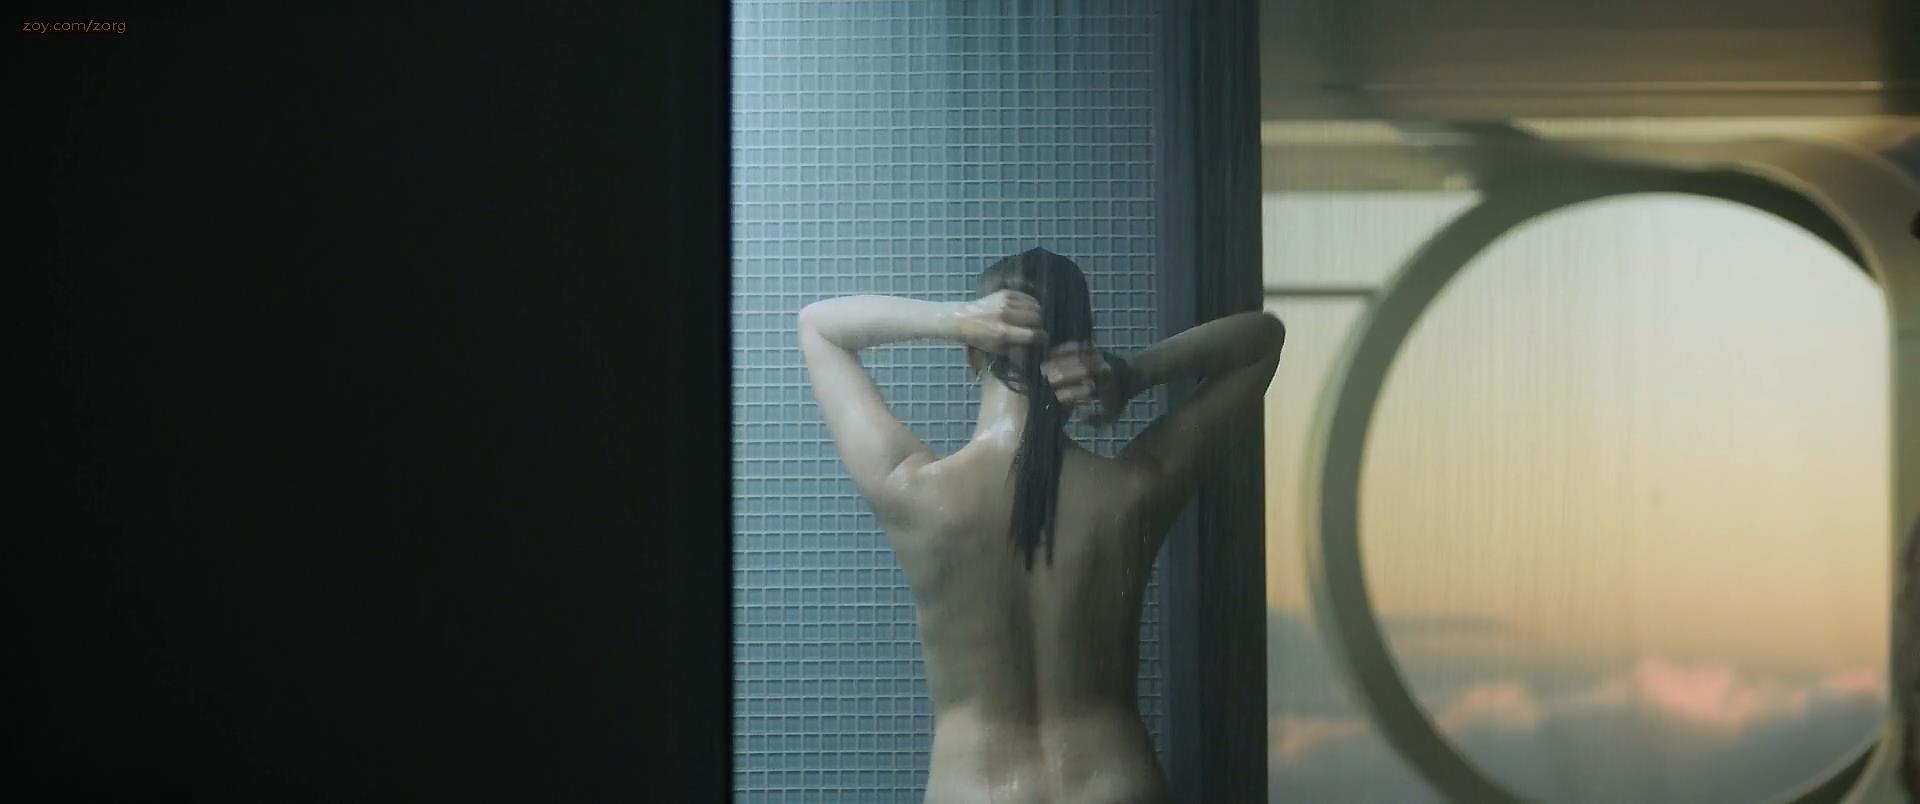 Andrea Riseborough Nude andrea riseborough nude skinny dipping - oblivion (2013) hd1080p